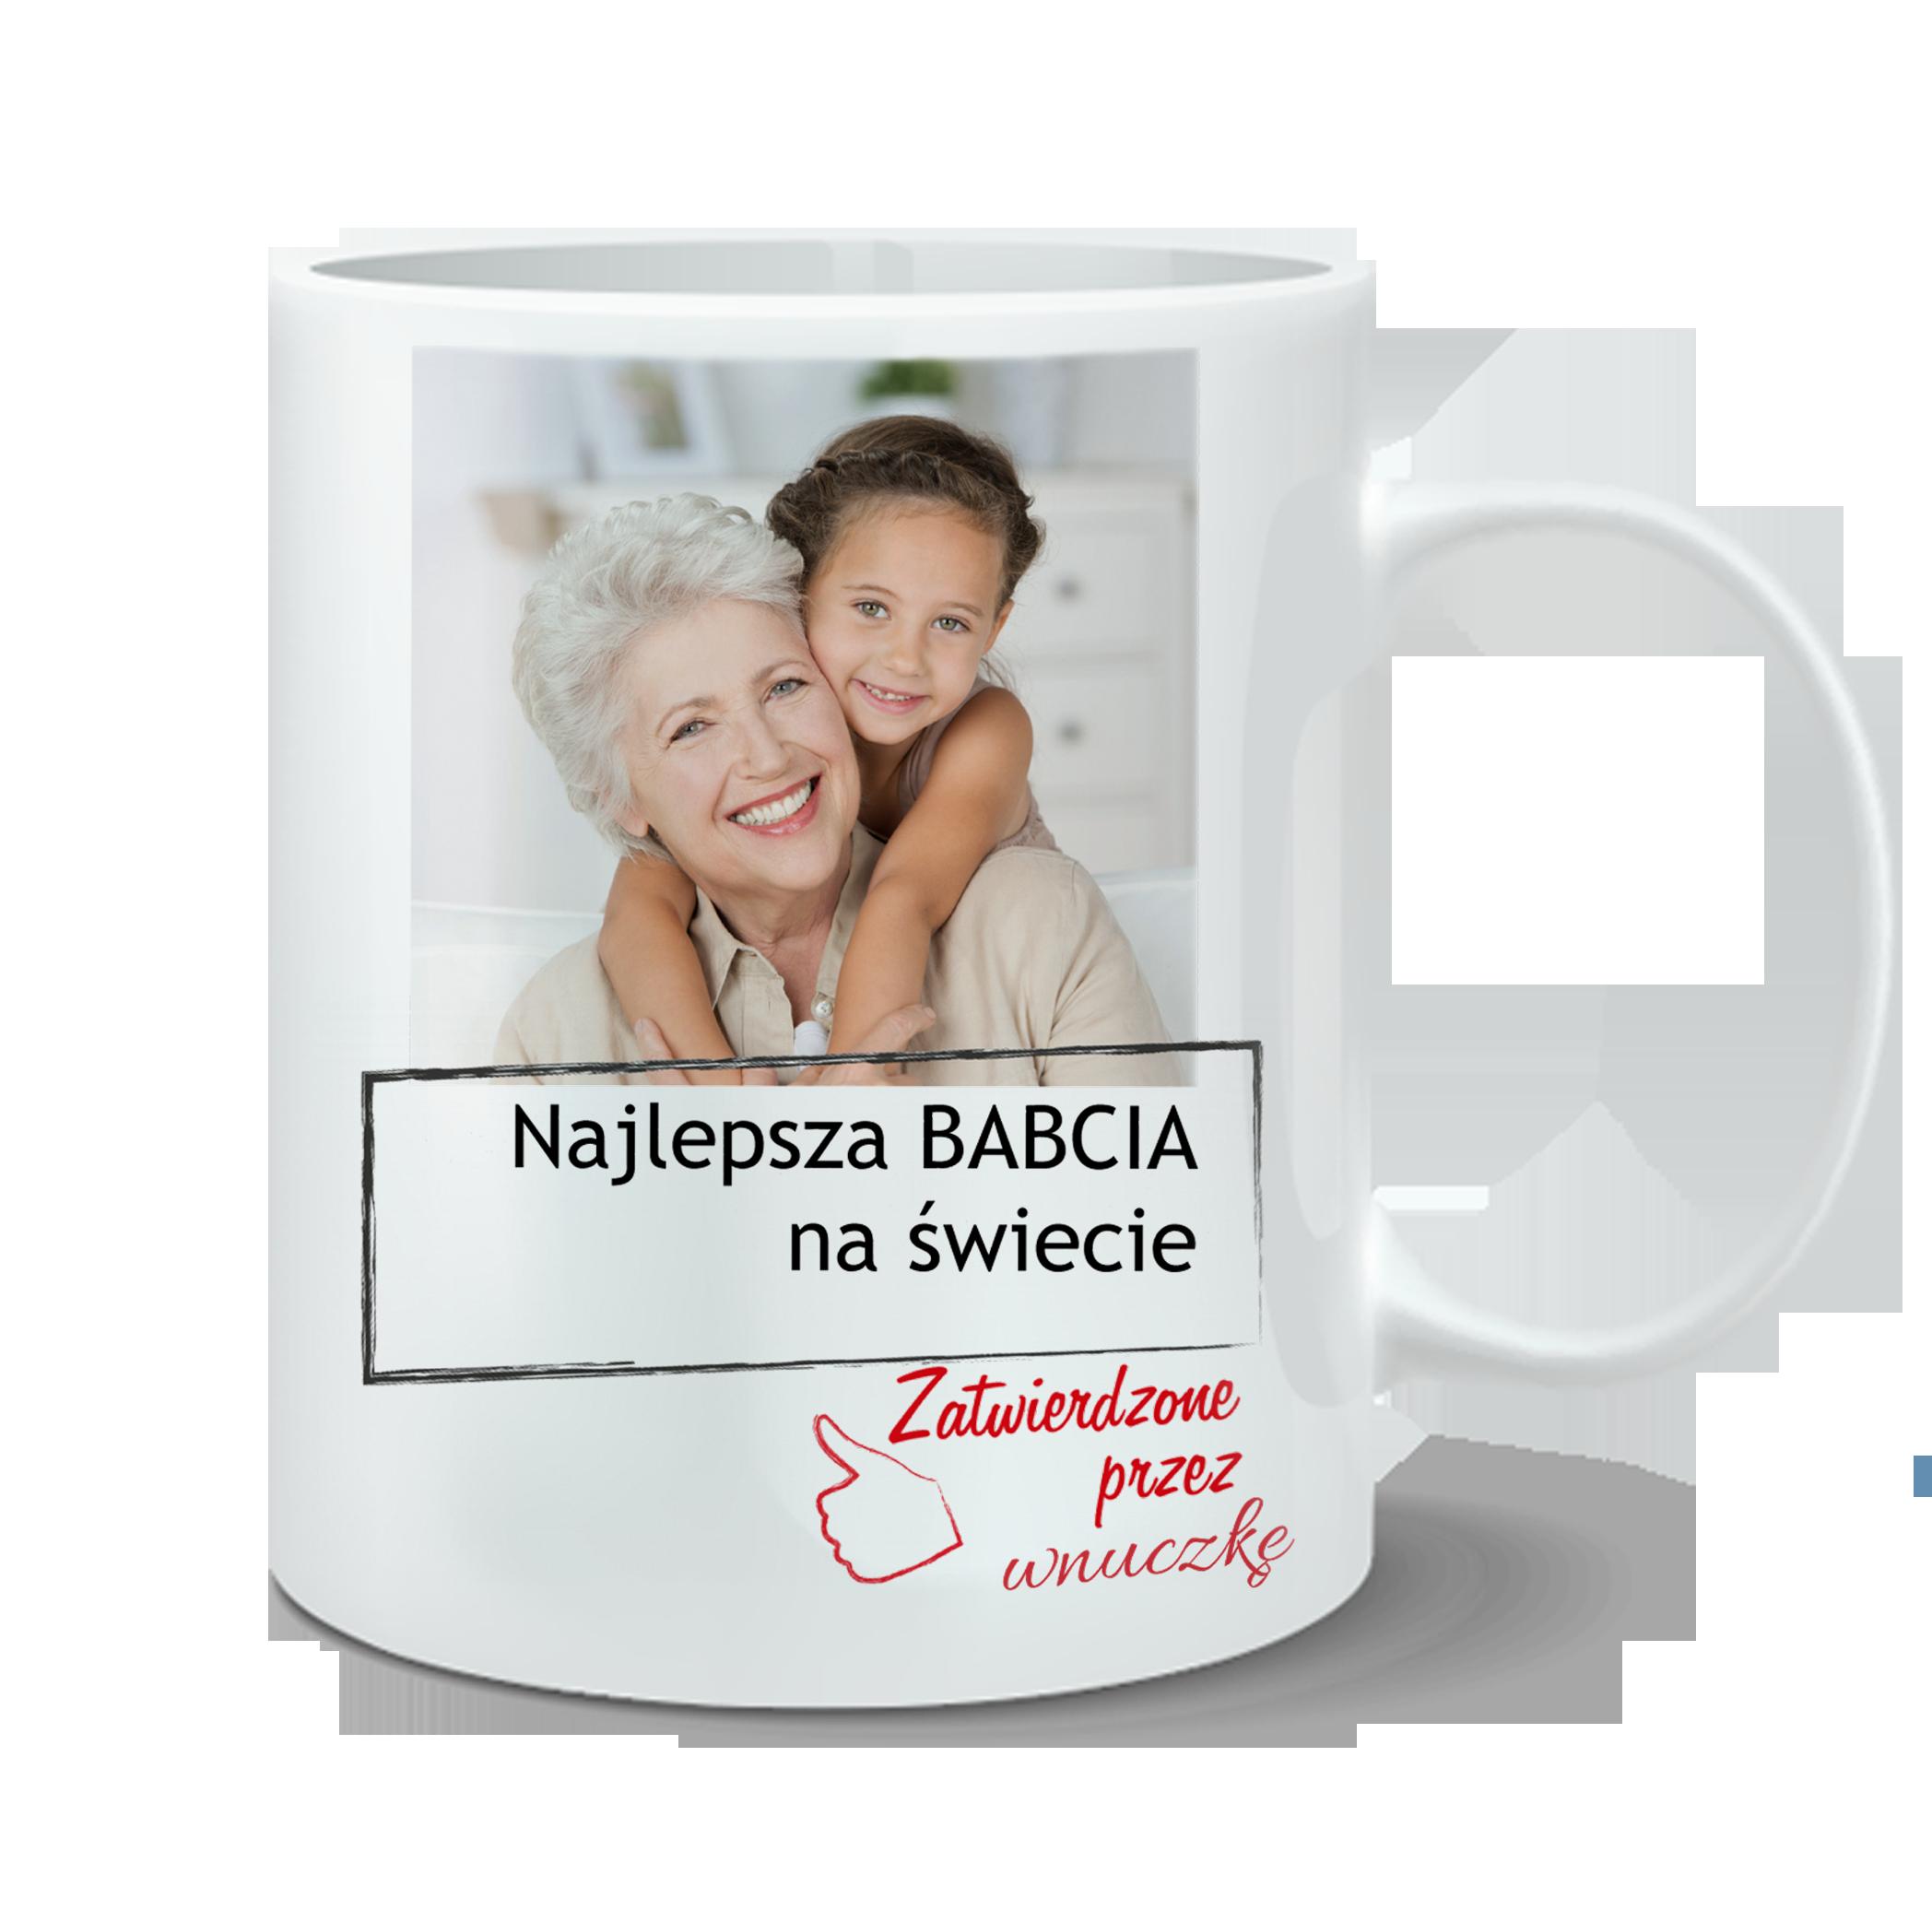 fotokubek Babcia_01